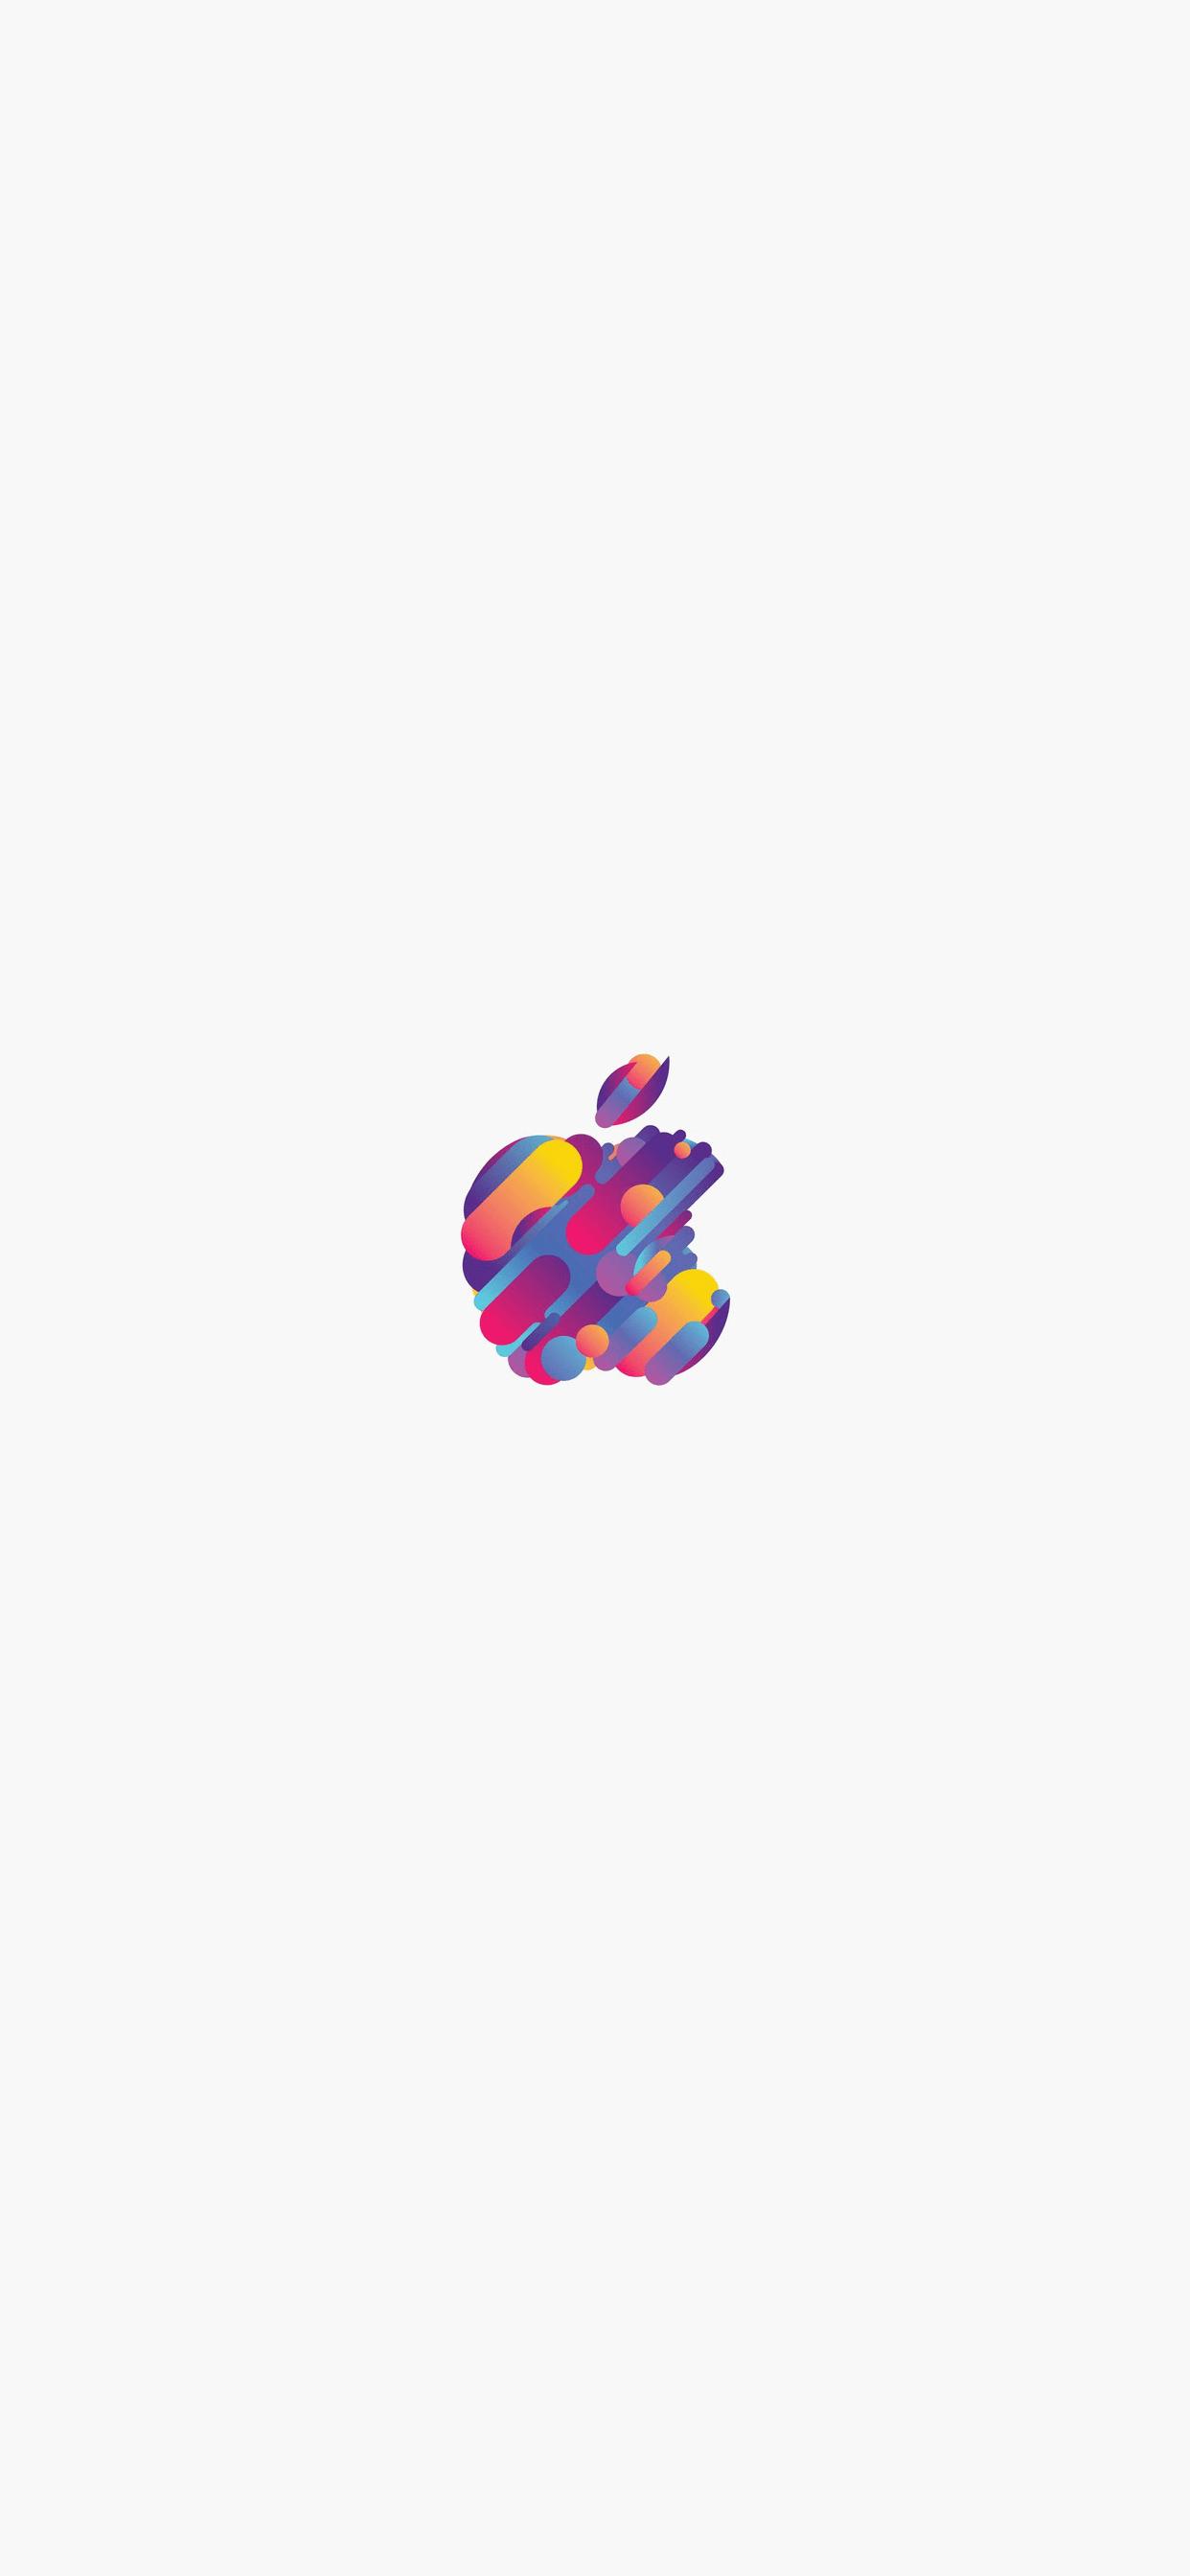 12 Apple logo